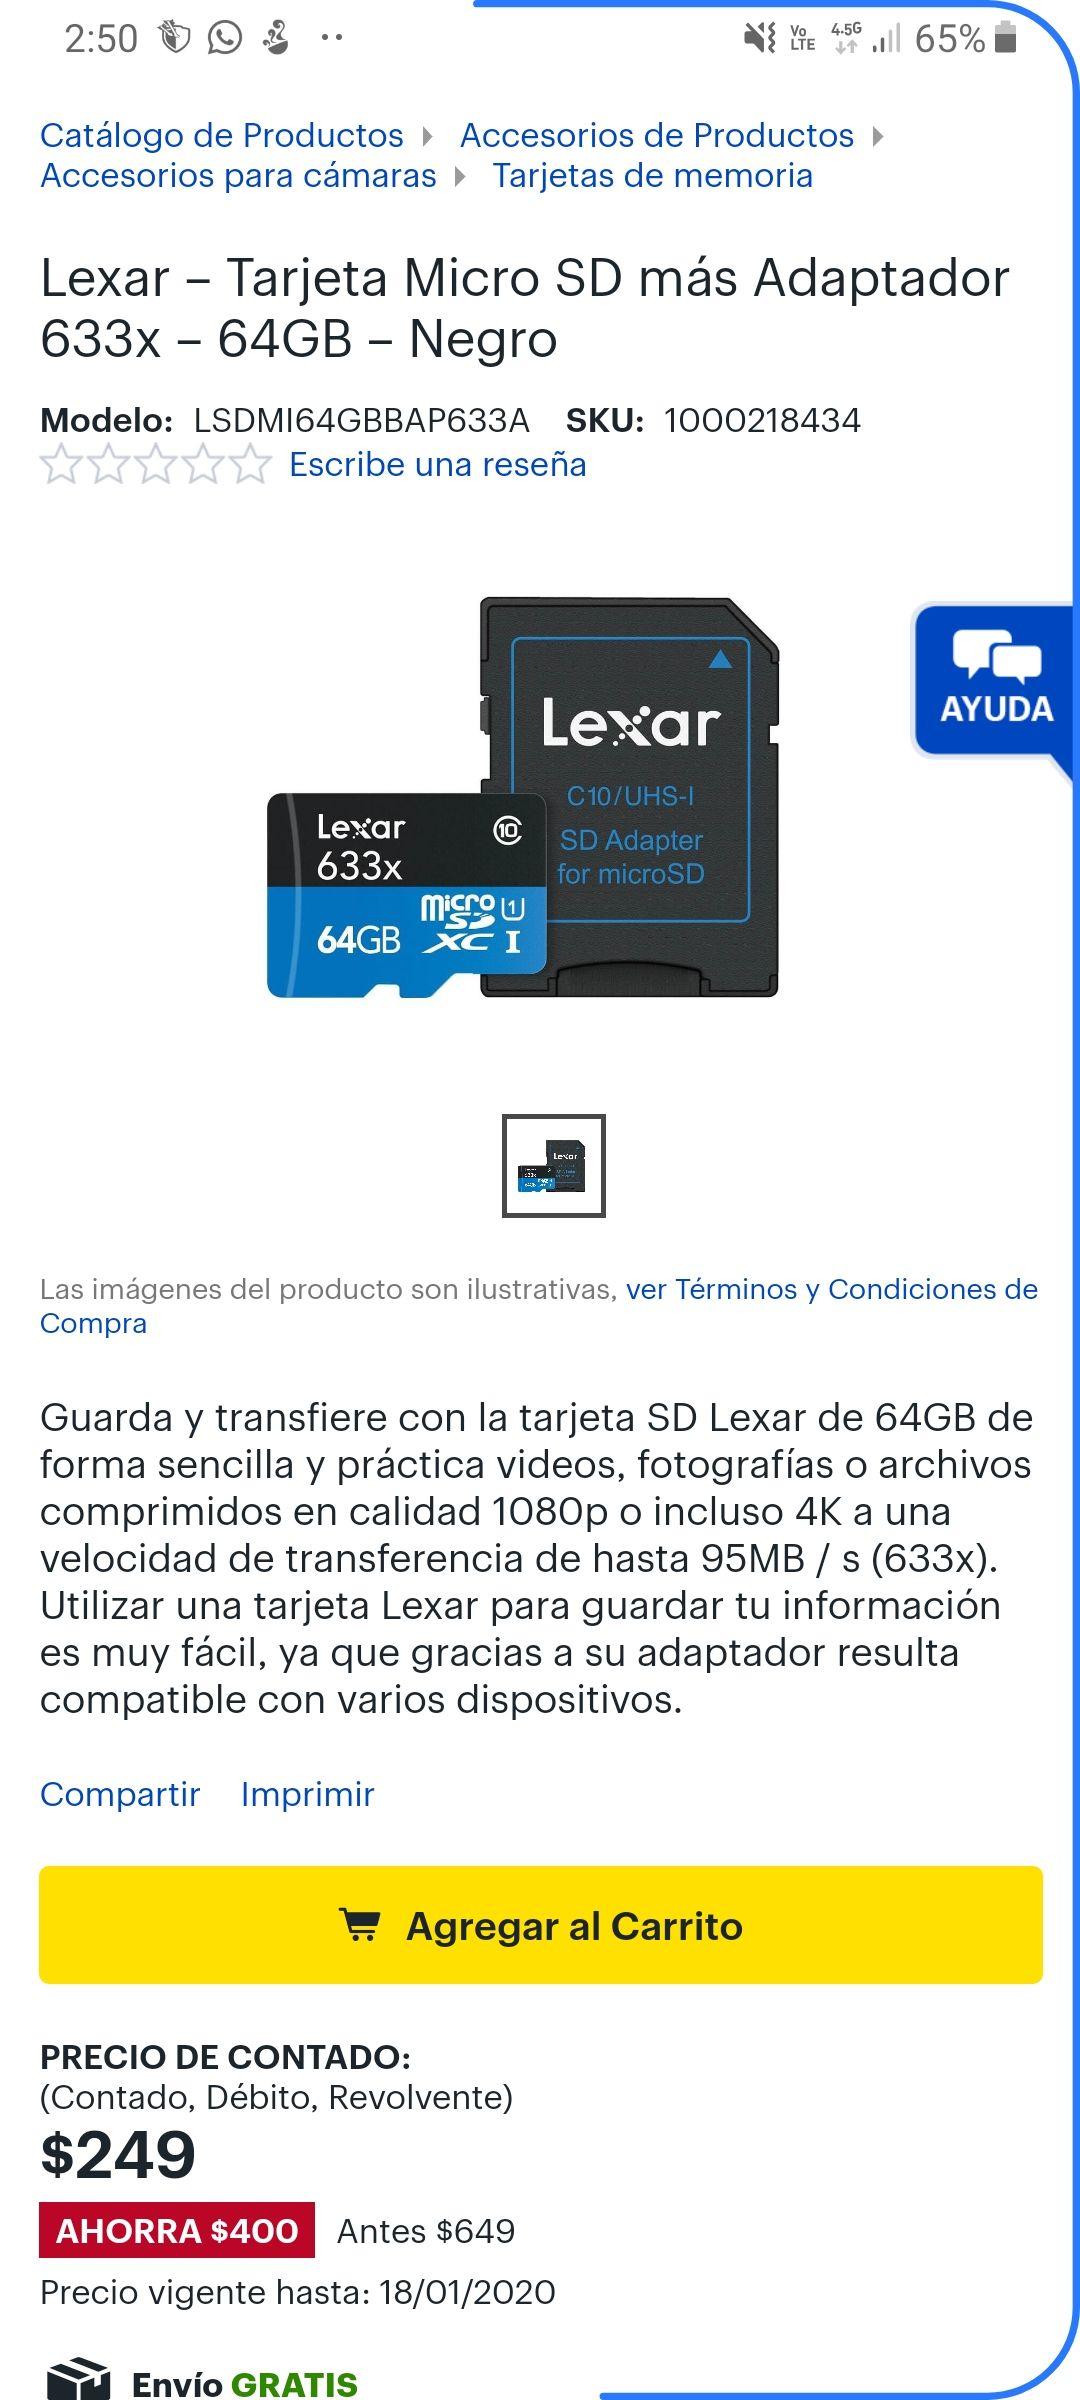 Best Buy: Lexar – Tarjeta Micro SD más Adaptador 633x – 64GB – Negro